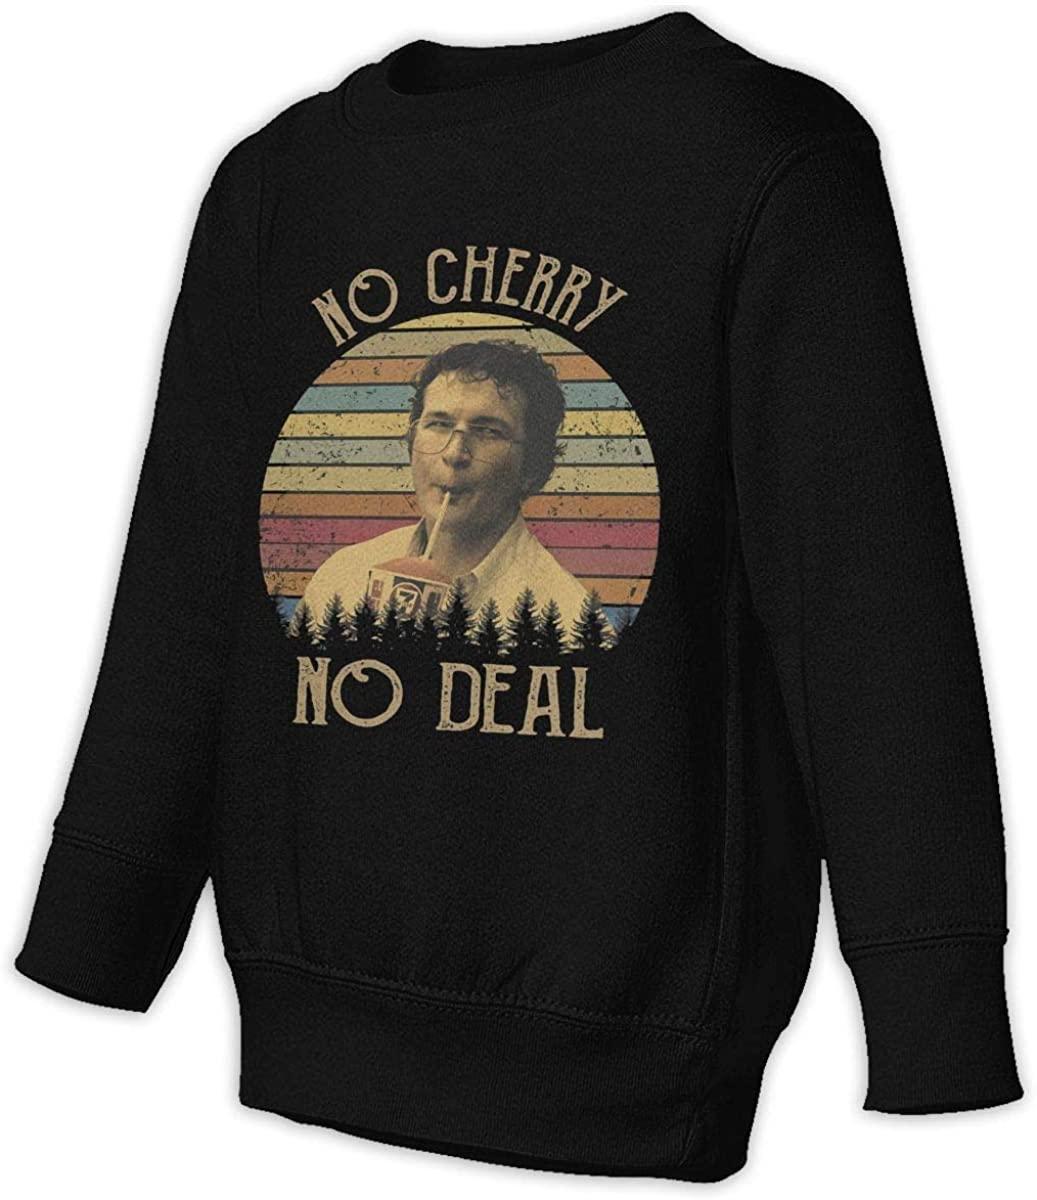 LSHLKJDFN No Cherry No Deal Vintage Unisex Sweatshirt Youth Boy and Girls Pullover Sweatshirt Black